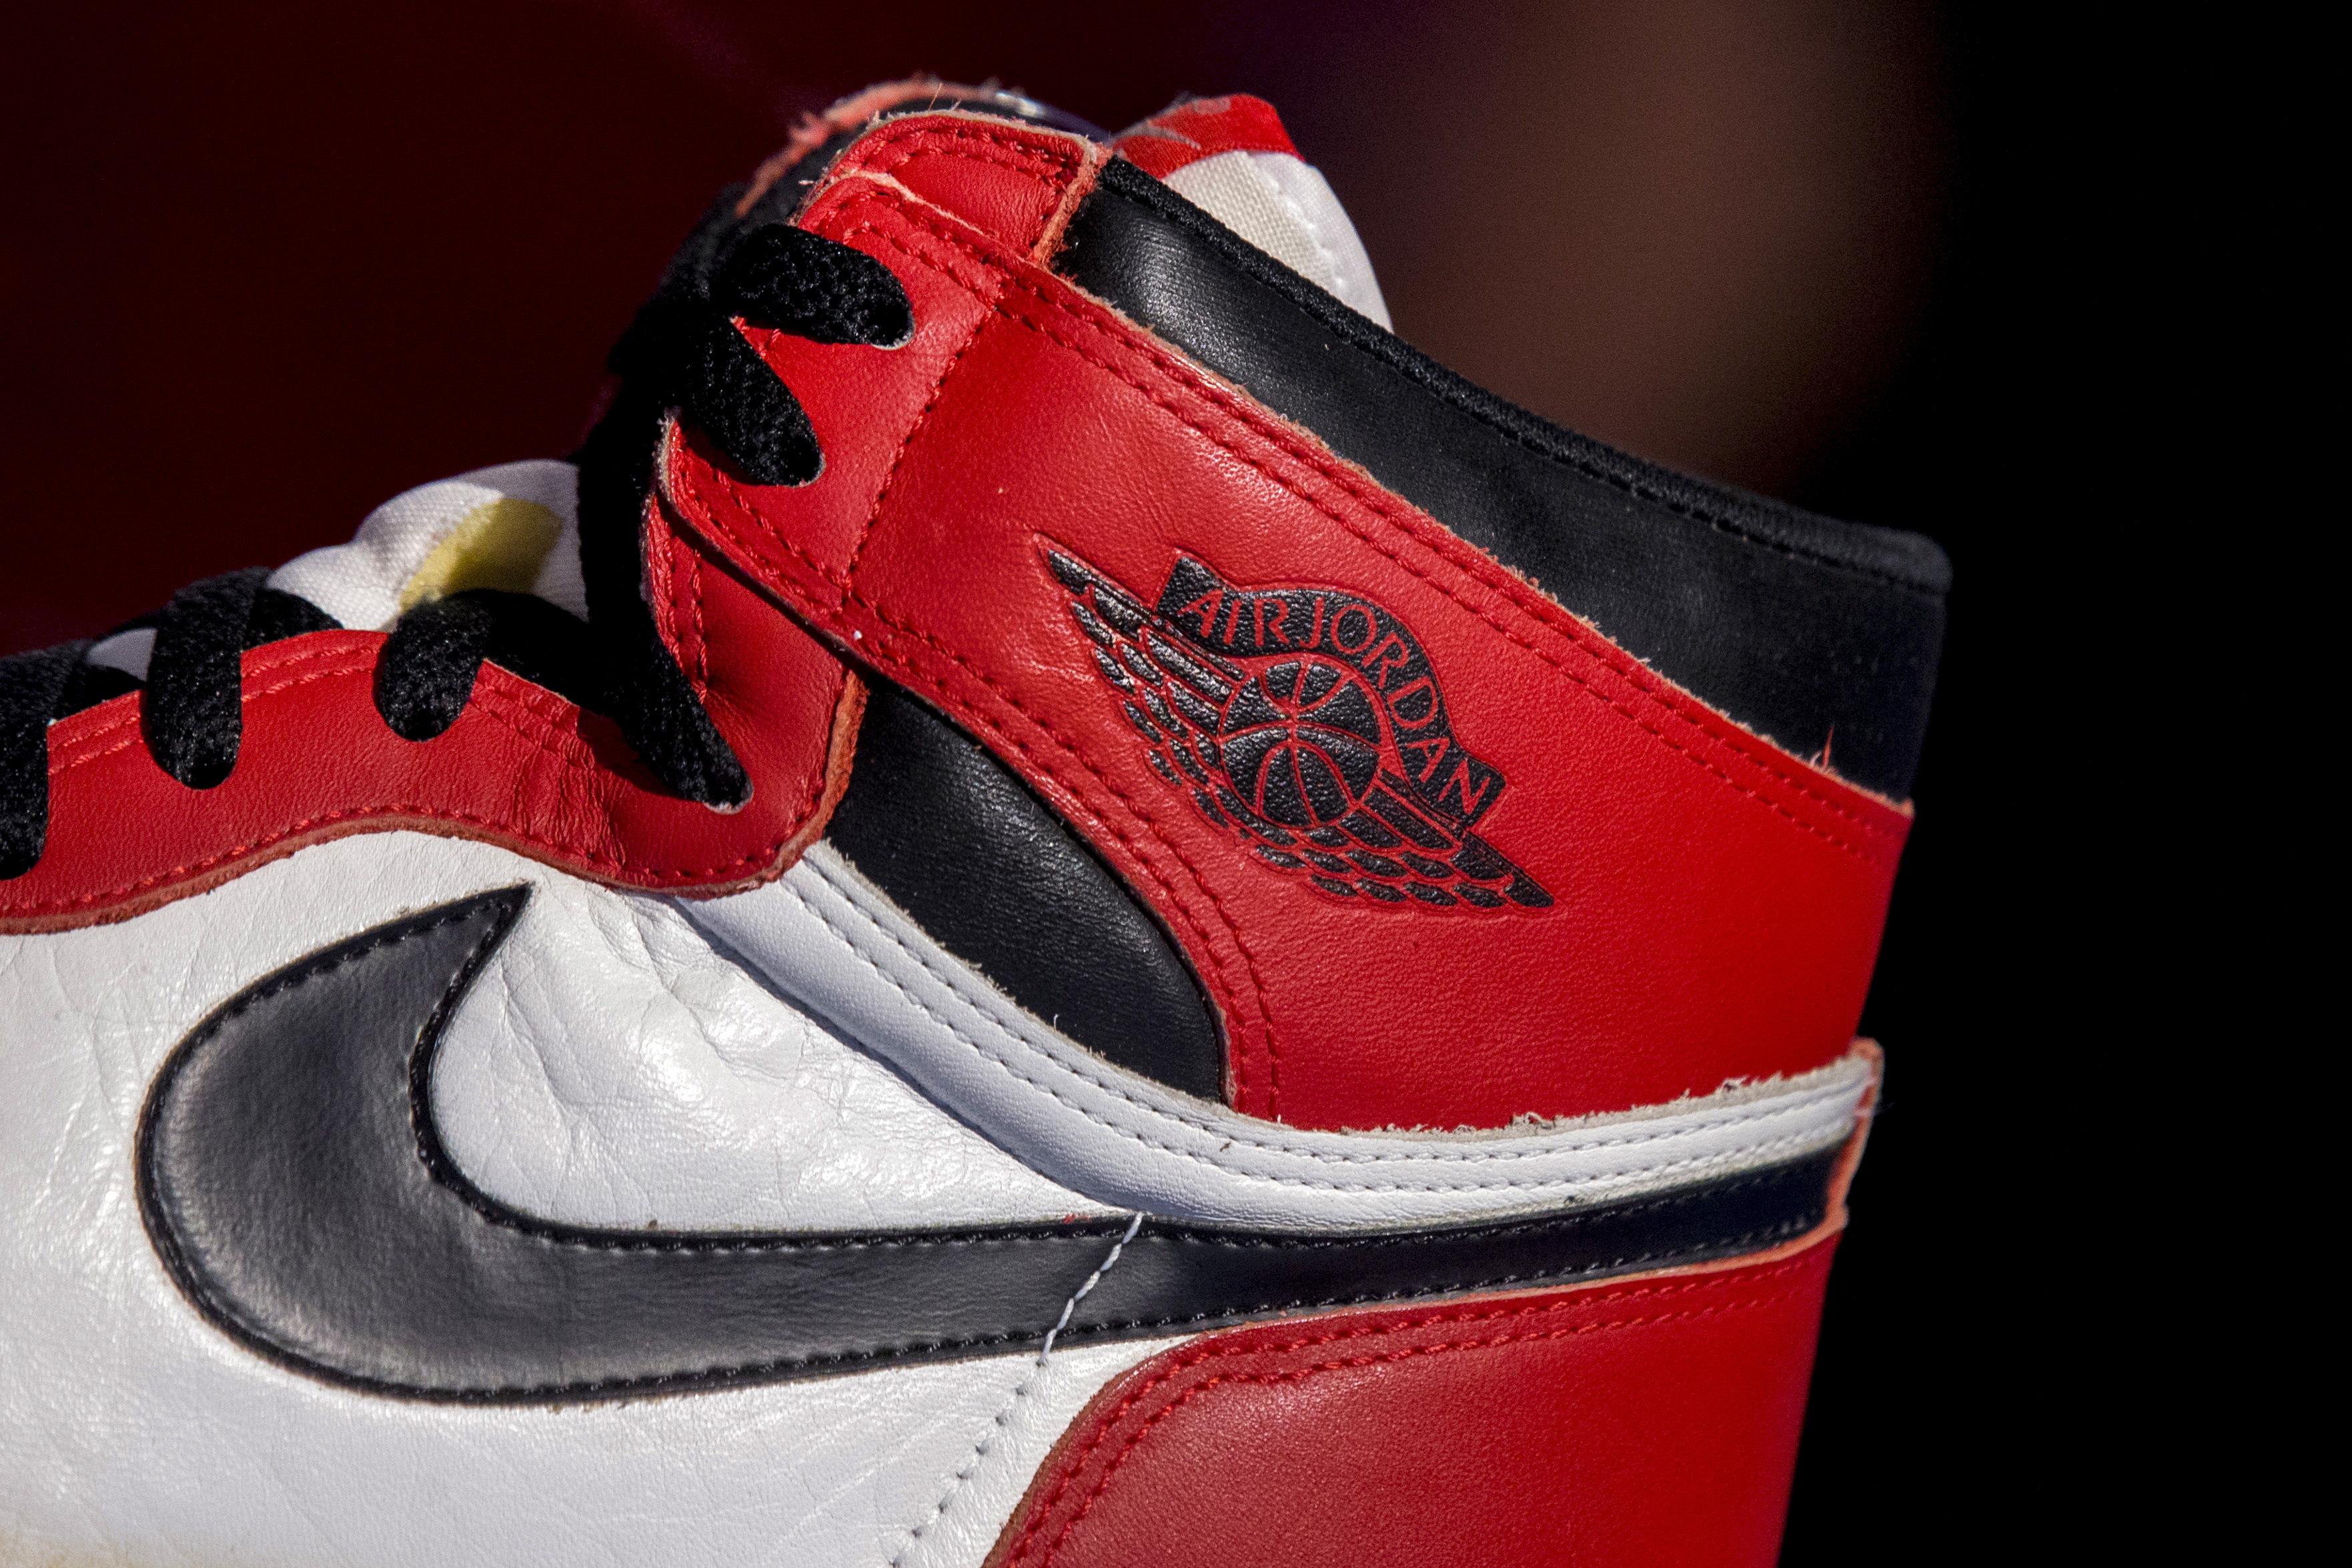 The famous Nike swoosh and Air Jordan logo is seen on an Air Jordan 1